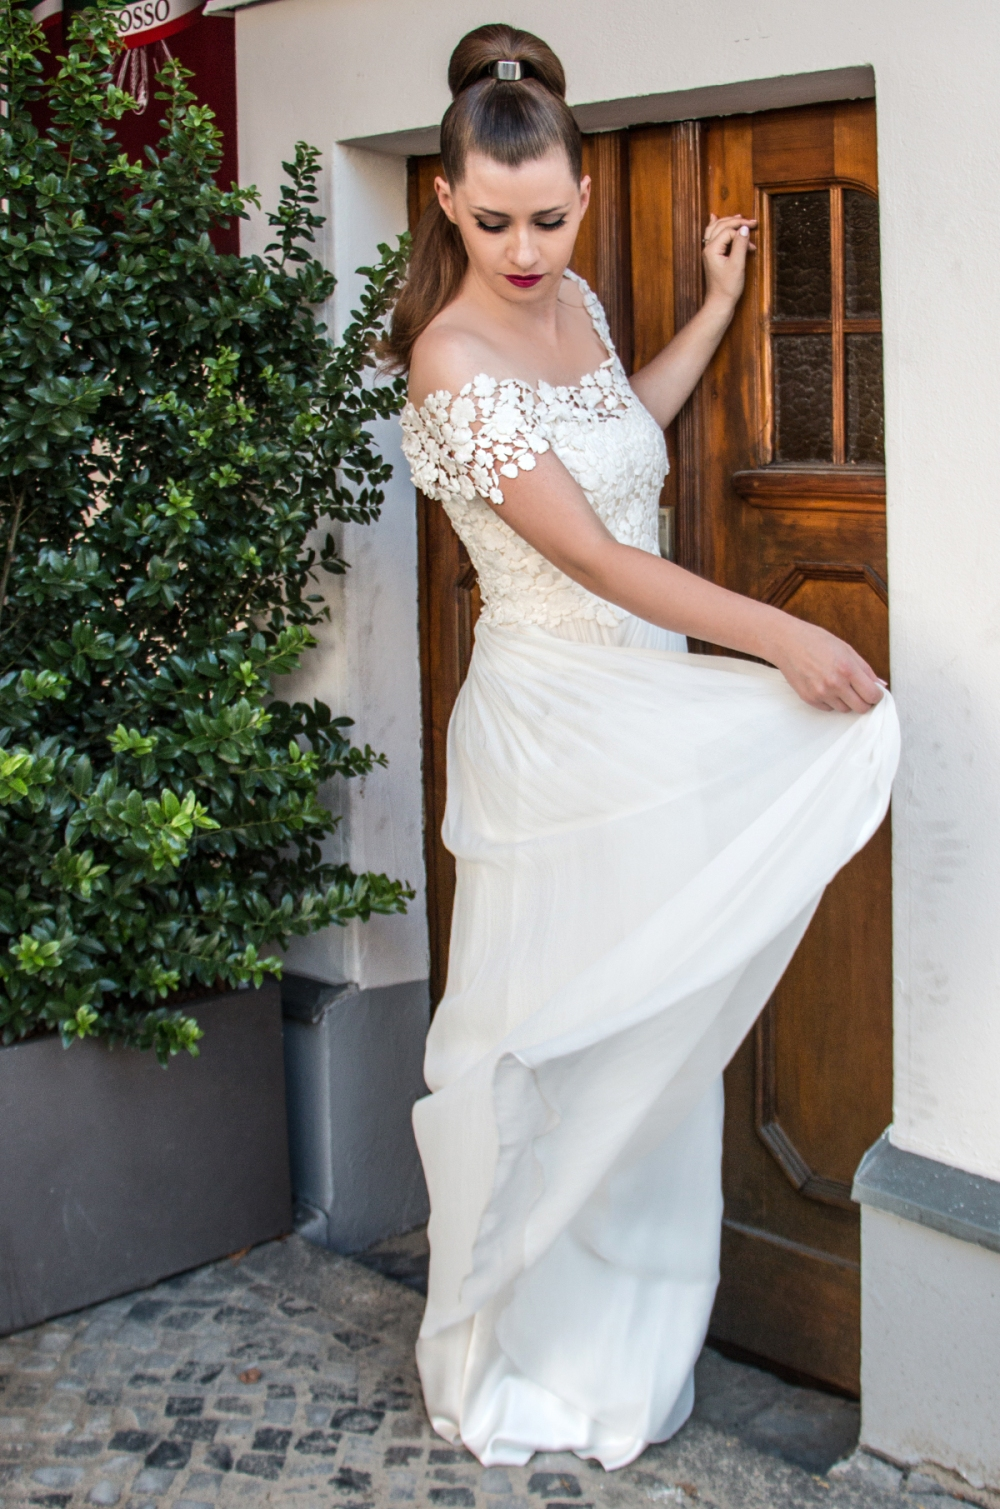 Kontrastreiches Brautstyling Jennifer Lopez inspired moderner Twist BineLovesLife